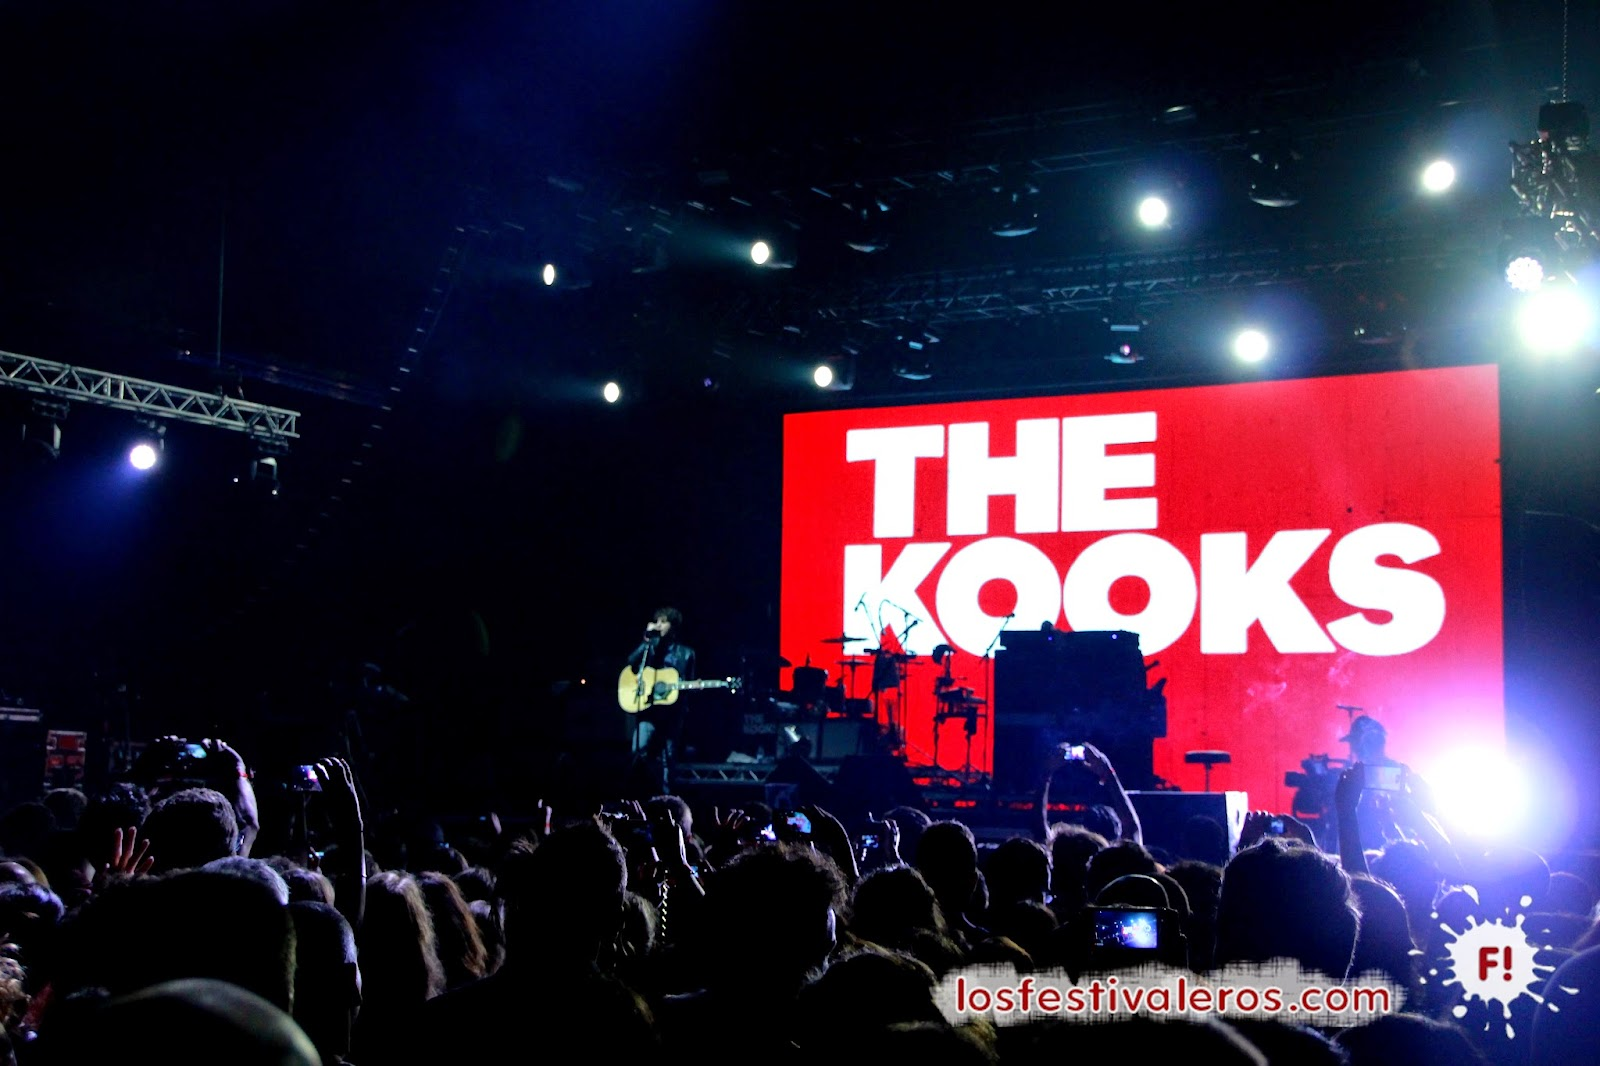 BIME Live, 2014, Festival, Concierto, Bilbao, The Kooks